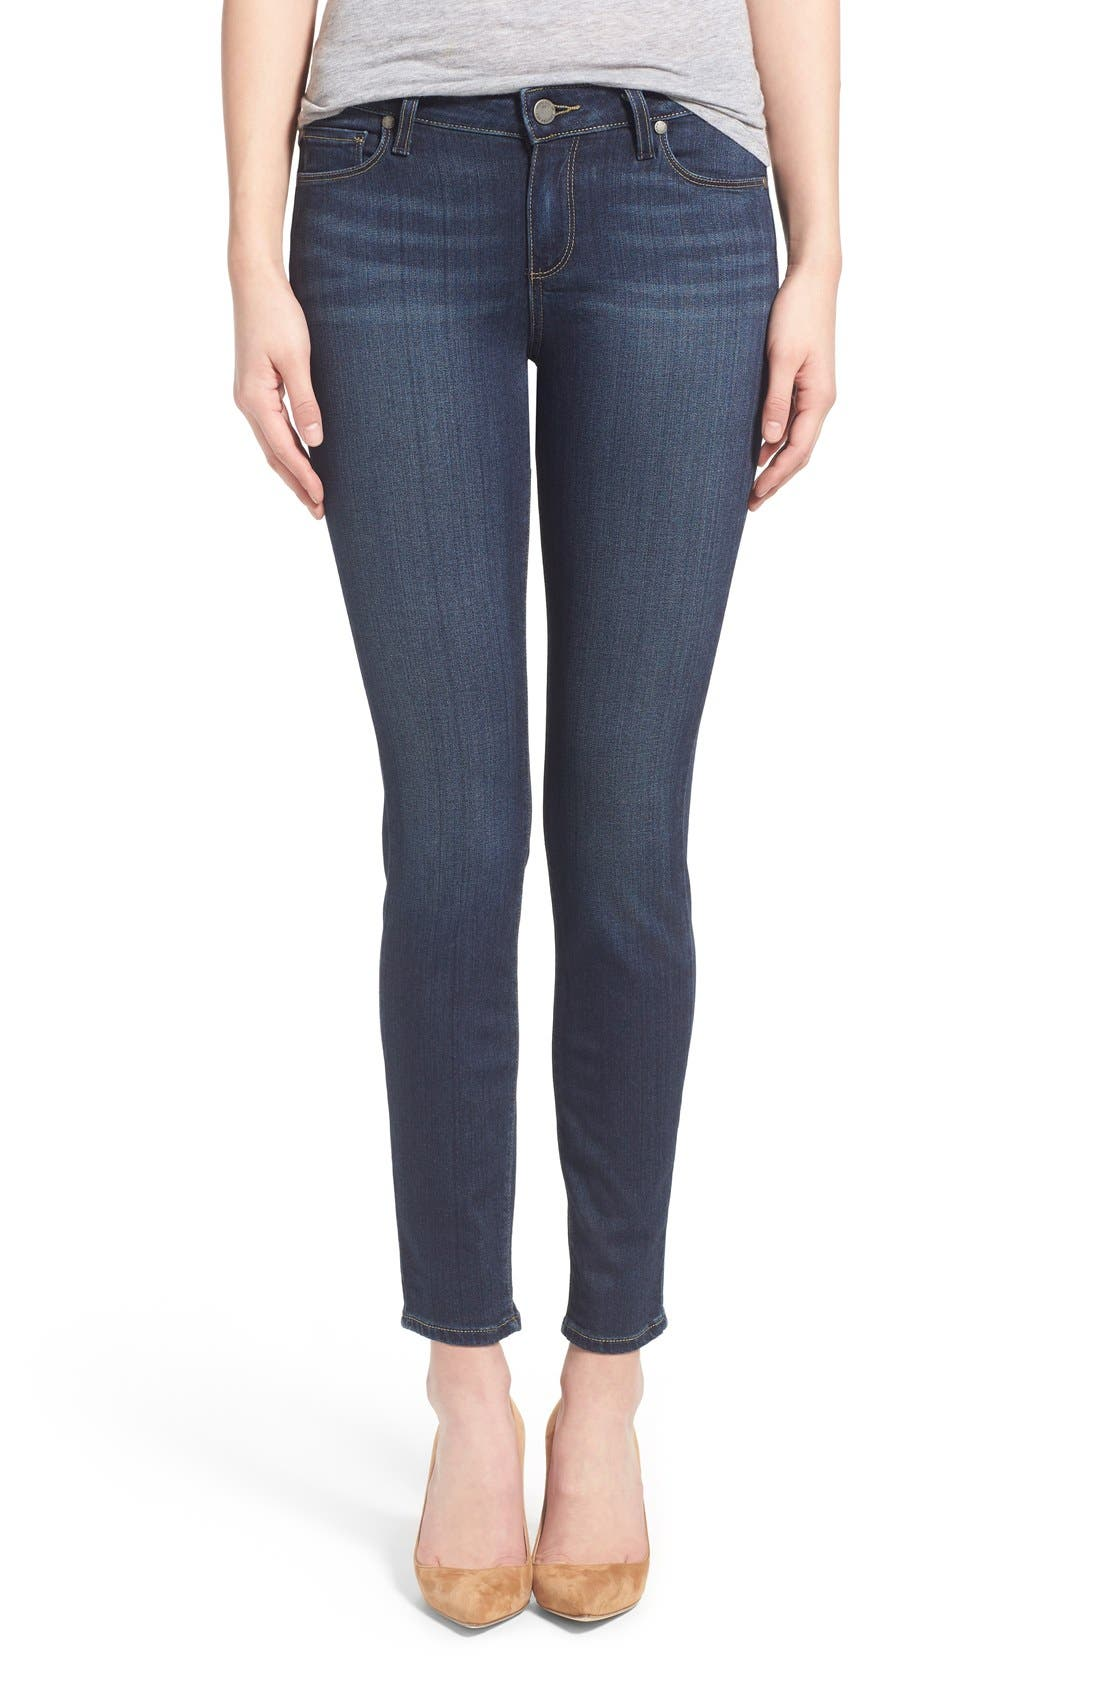 Alternate Image 1 Selected - Paige Denim 'Transcend - Verdugo' Ankle Ultra Skinny Jeans (Nottingham) (Petite)